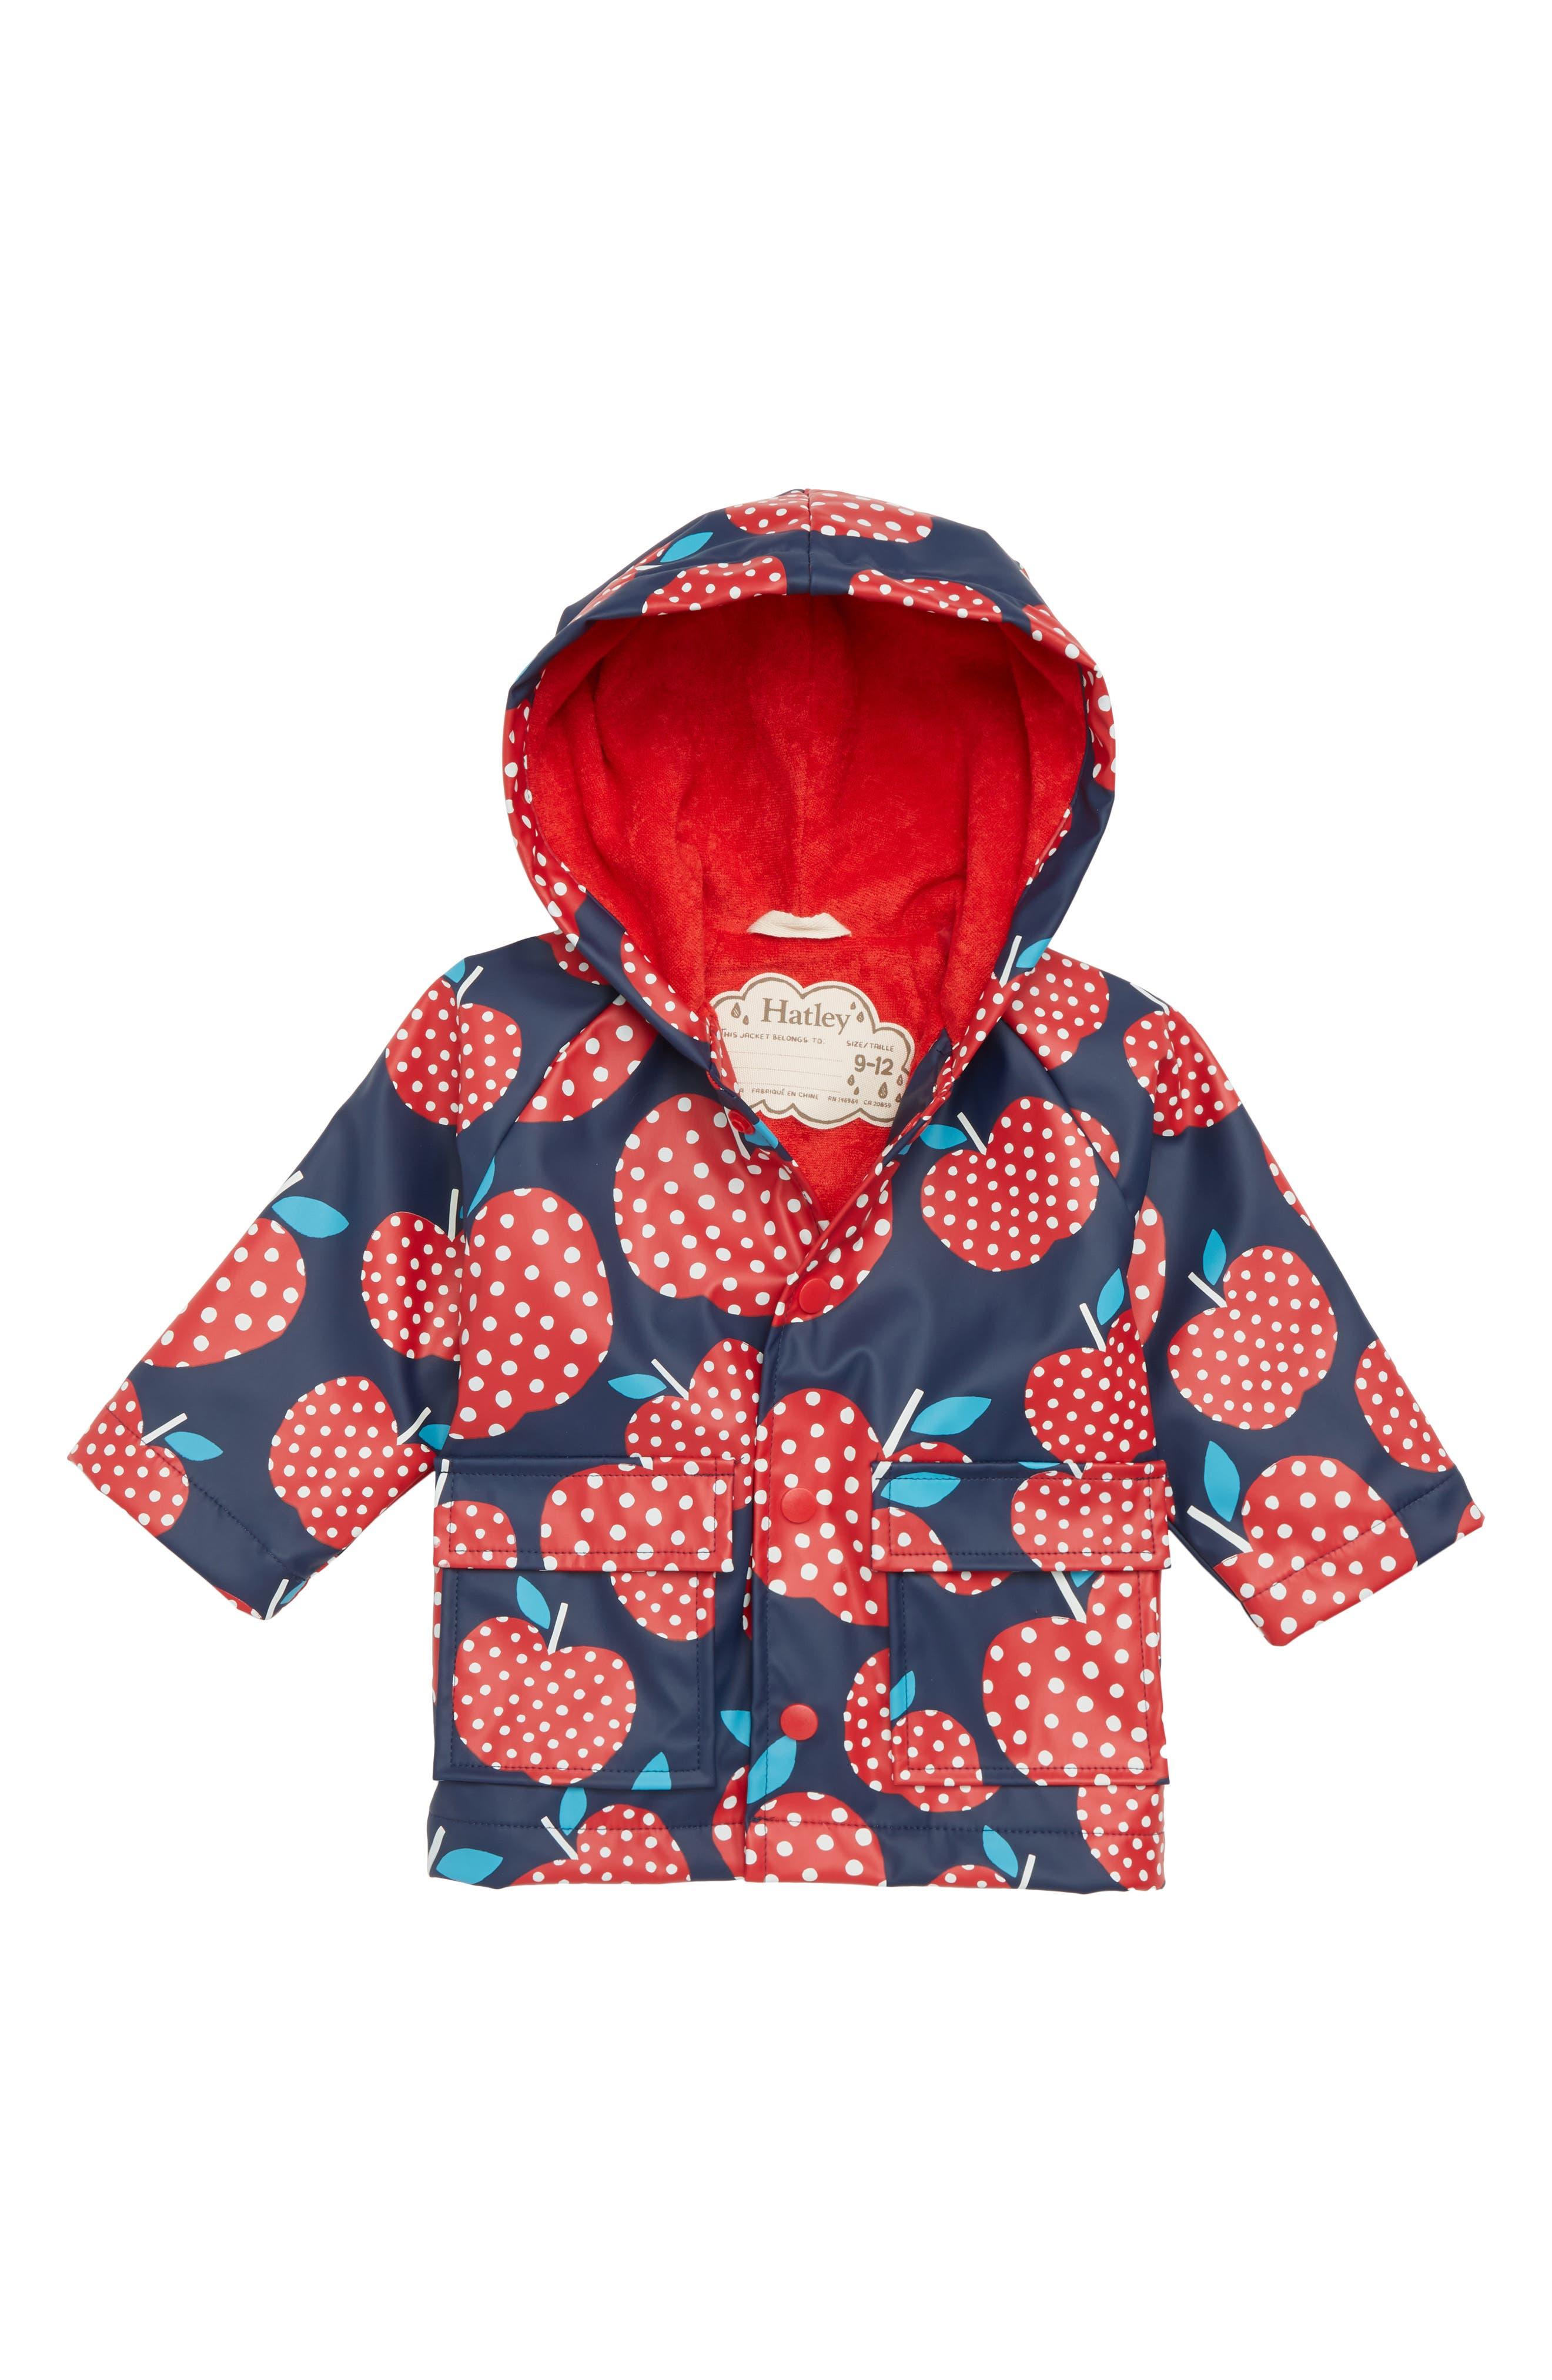 Polka Dot Apples Waterproof Hooded Raincoat,                         Main,                         color, 600